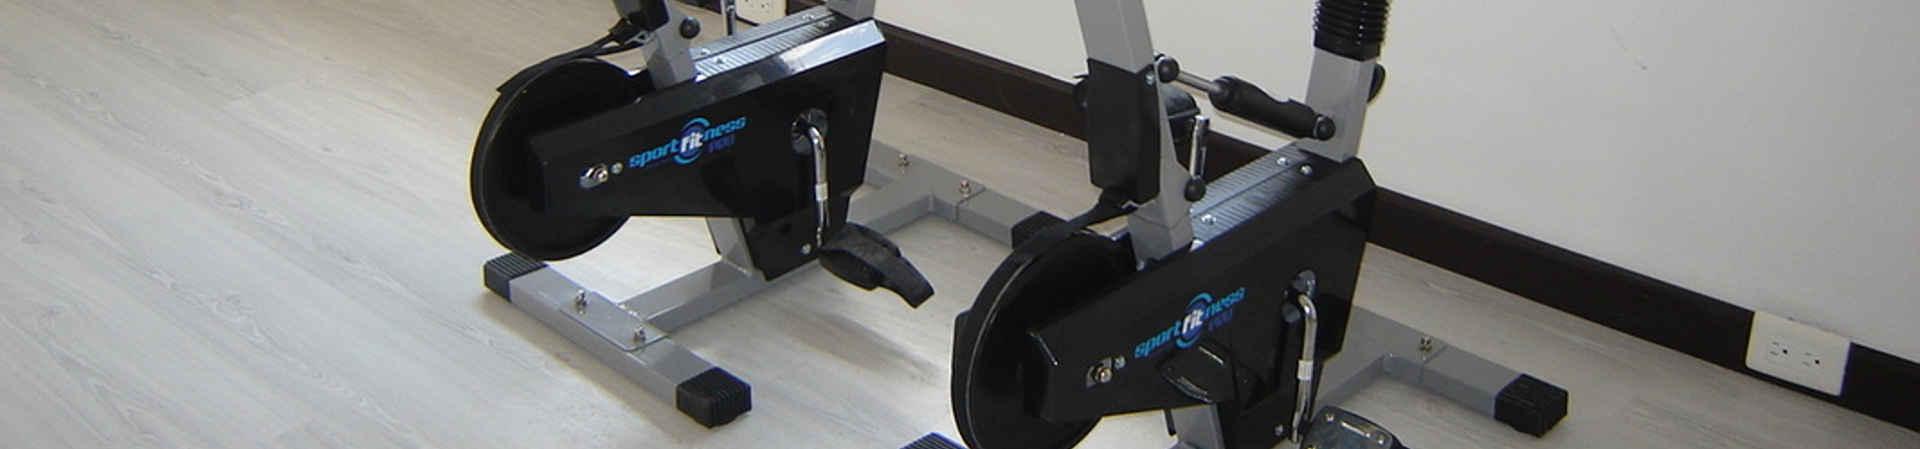 Presupuesto para mantenimiento gimnasio murcia for Gimnasio murcia